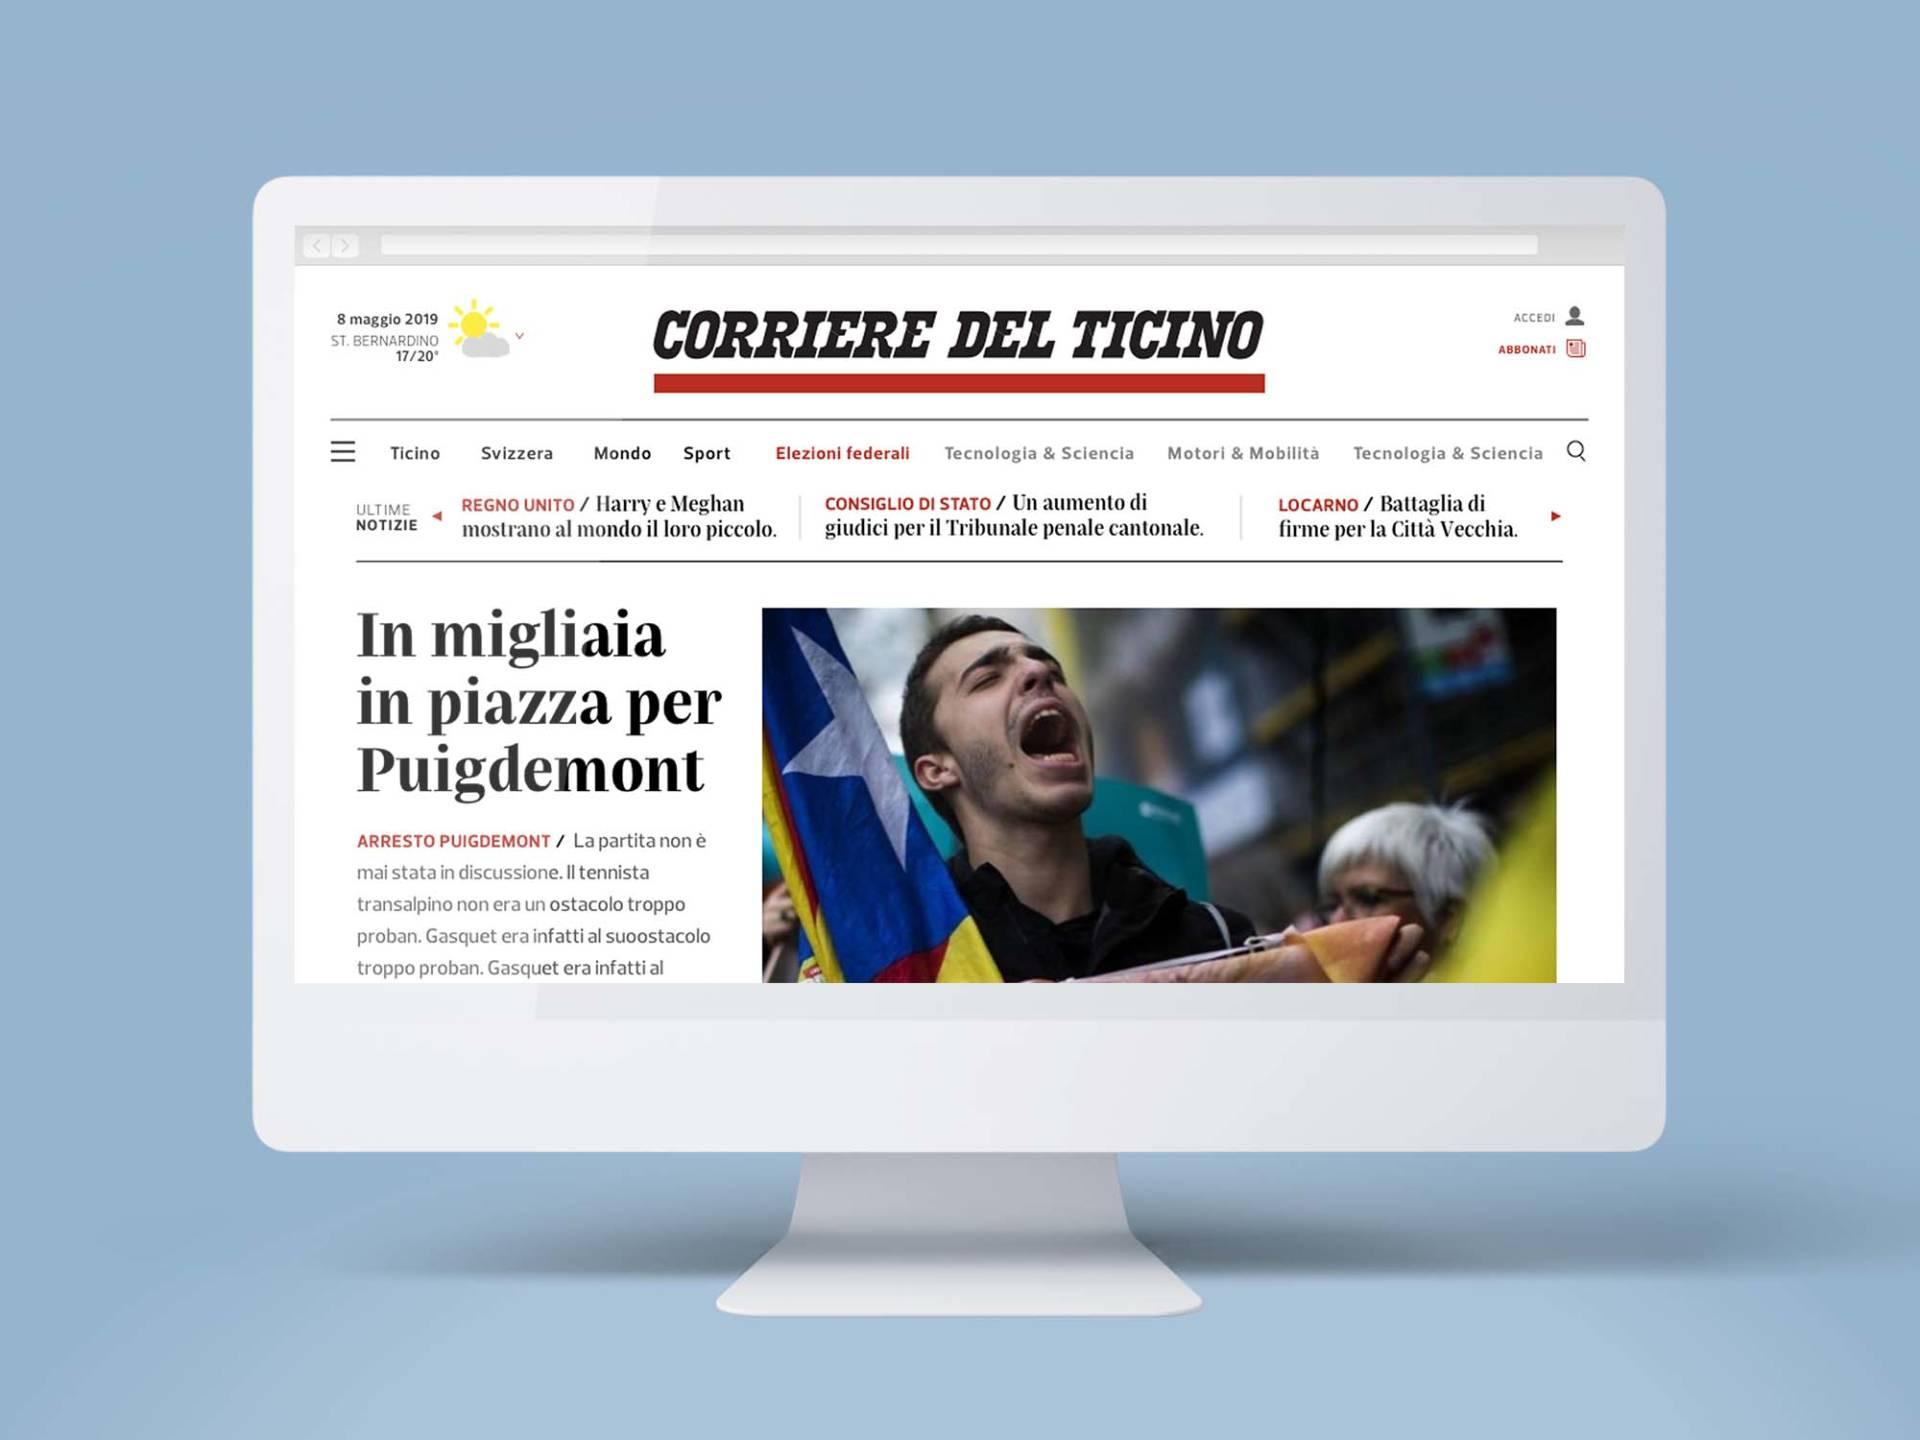 Corriere_del_Ticino web_01_Wenceslau_News_Design